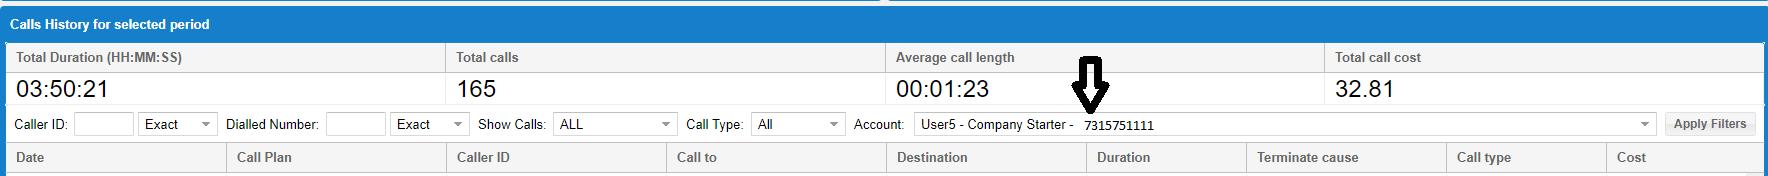 subaccount_usage.PNG